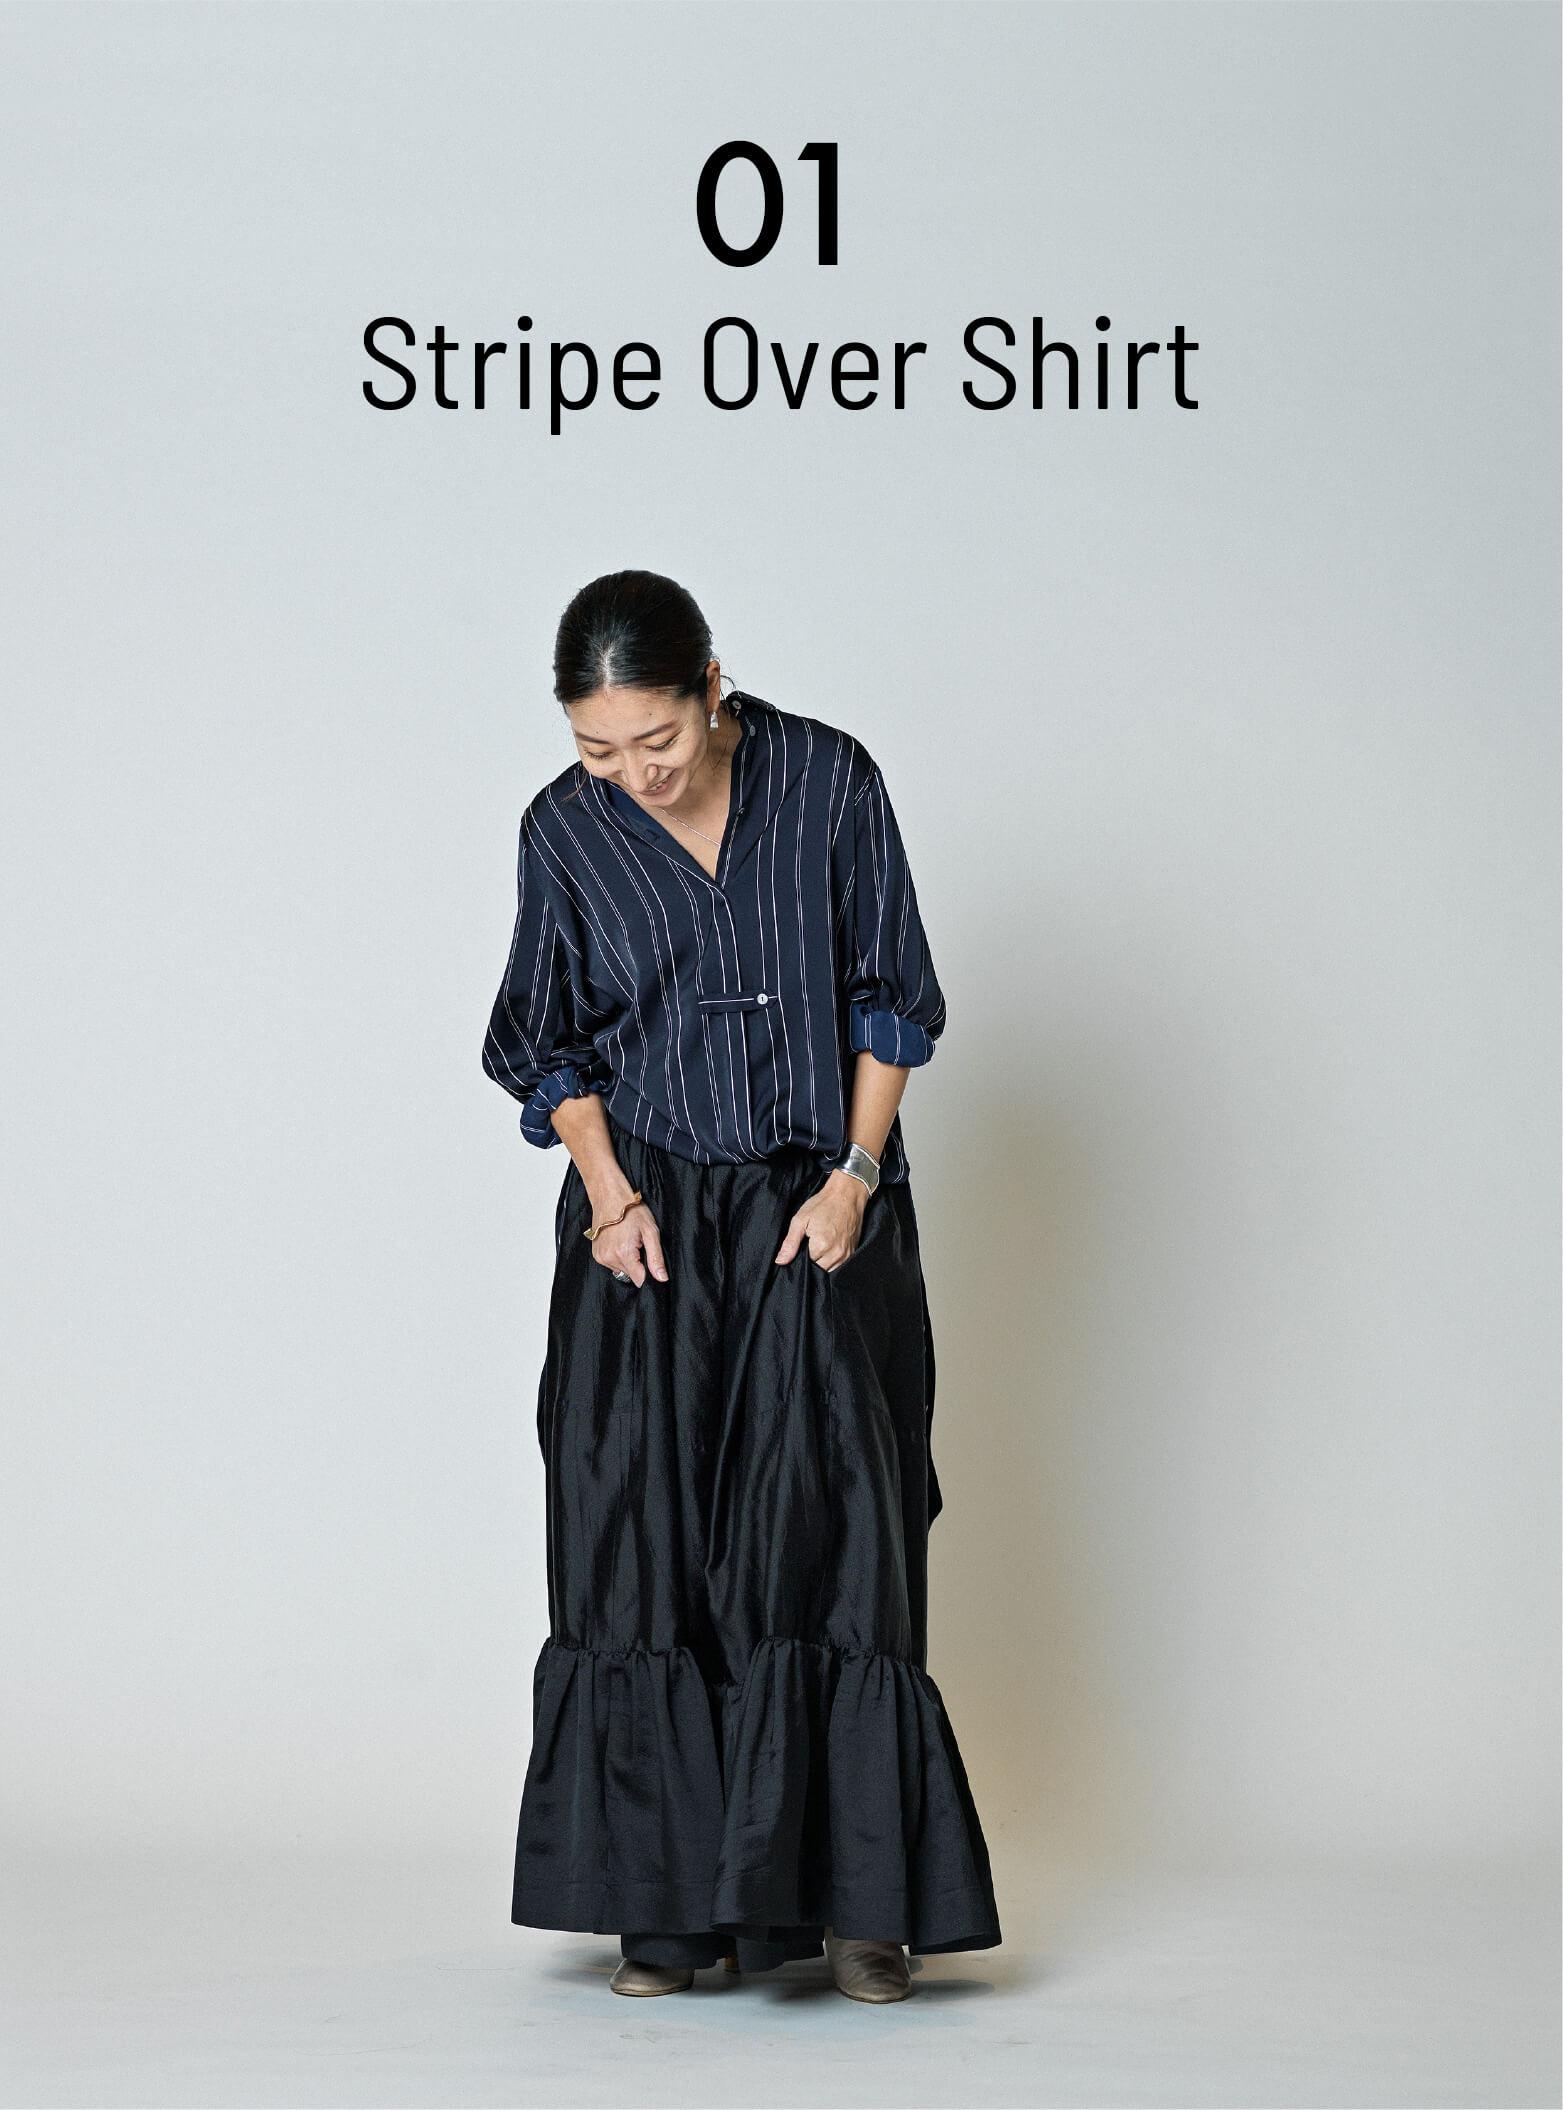 01 Stripe Over Shirt